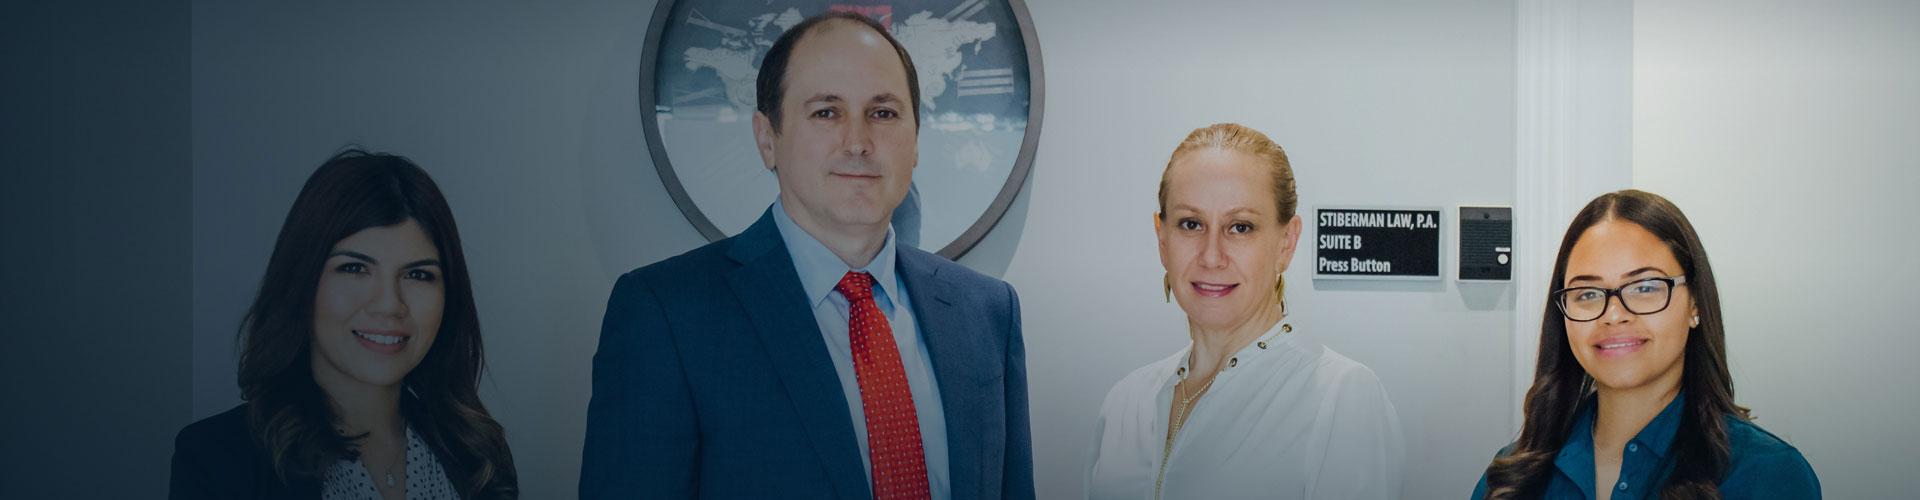 Foreclosure Defense Attorneys - Stiberman Law Firm